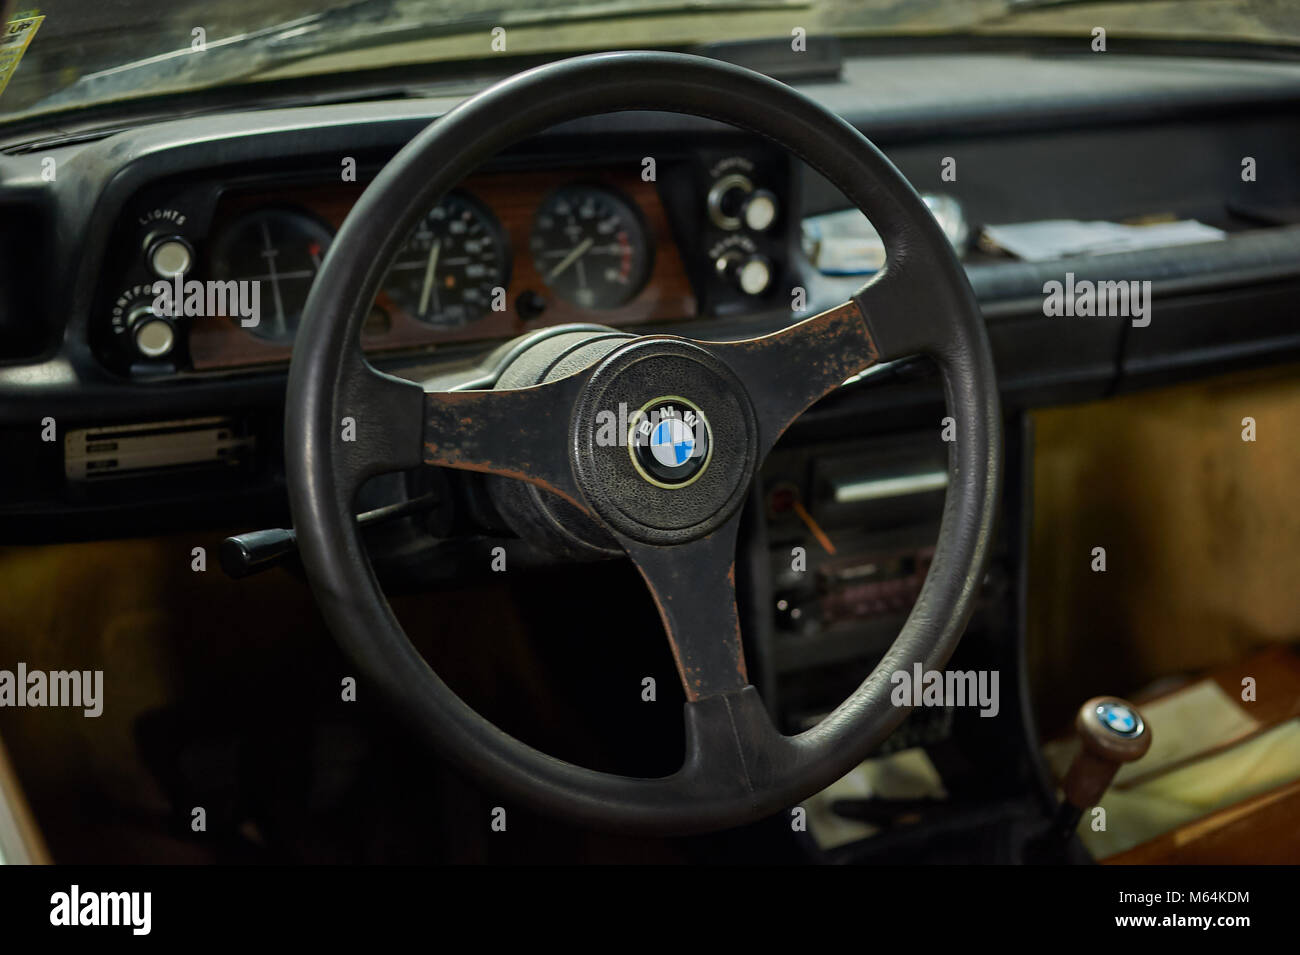 Vintage Bmw Steering Wheel Stock Photo Alamy